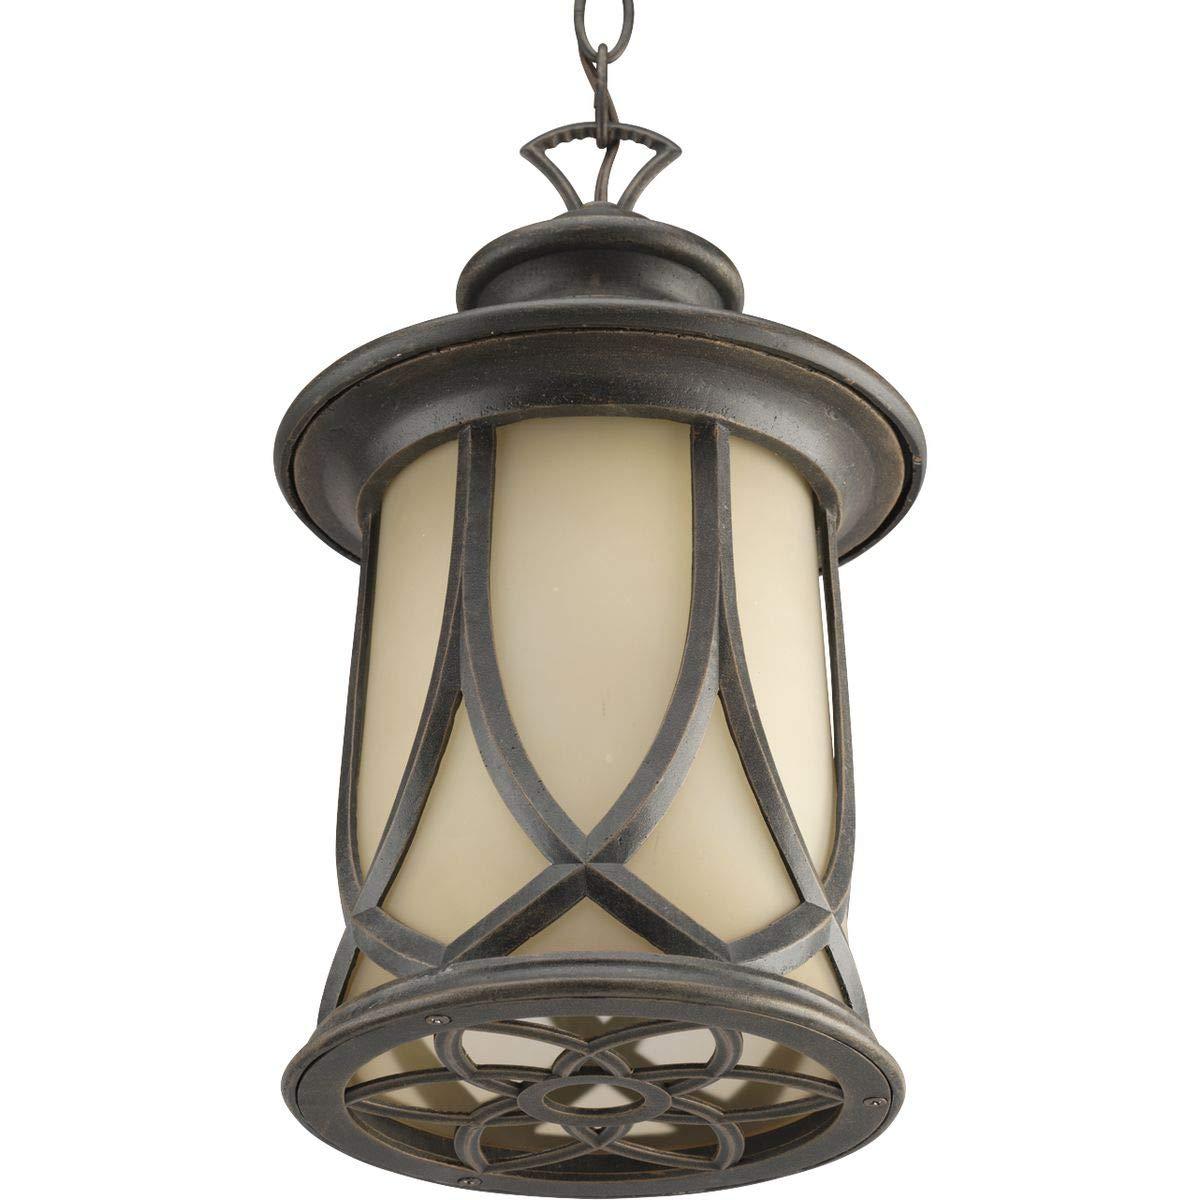 Progress Lighting P6504-122 Resort Collection 1-Light Hanging Lantern, Aged Copper